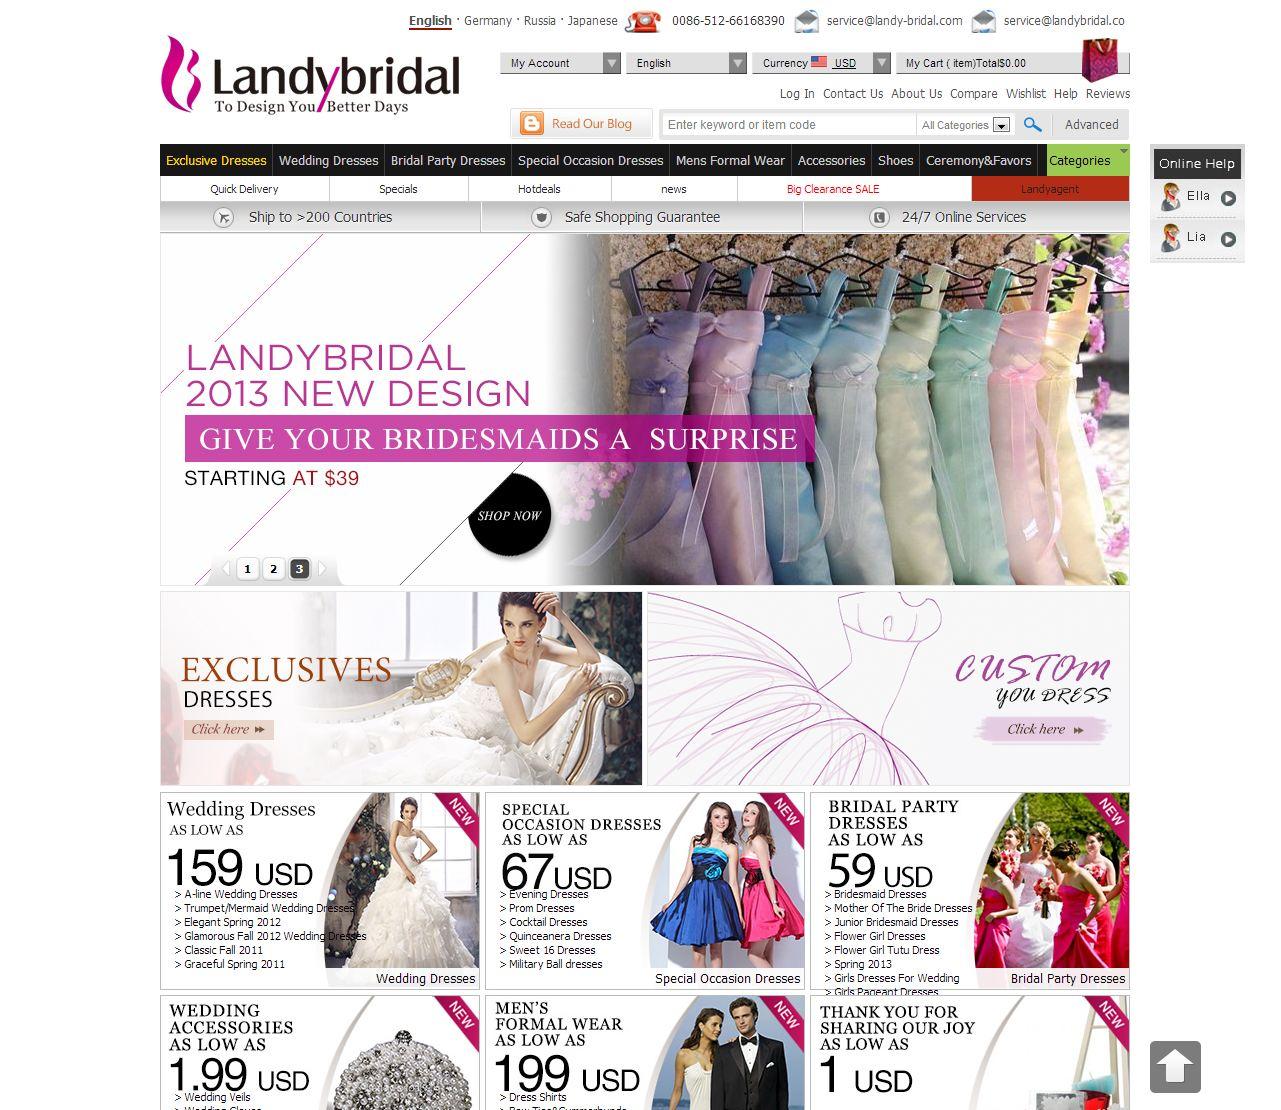 LandyBridal